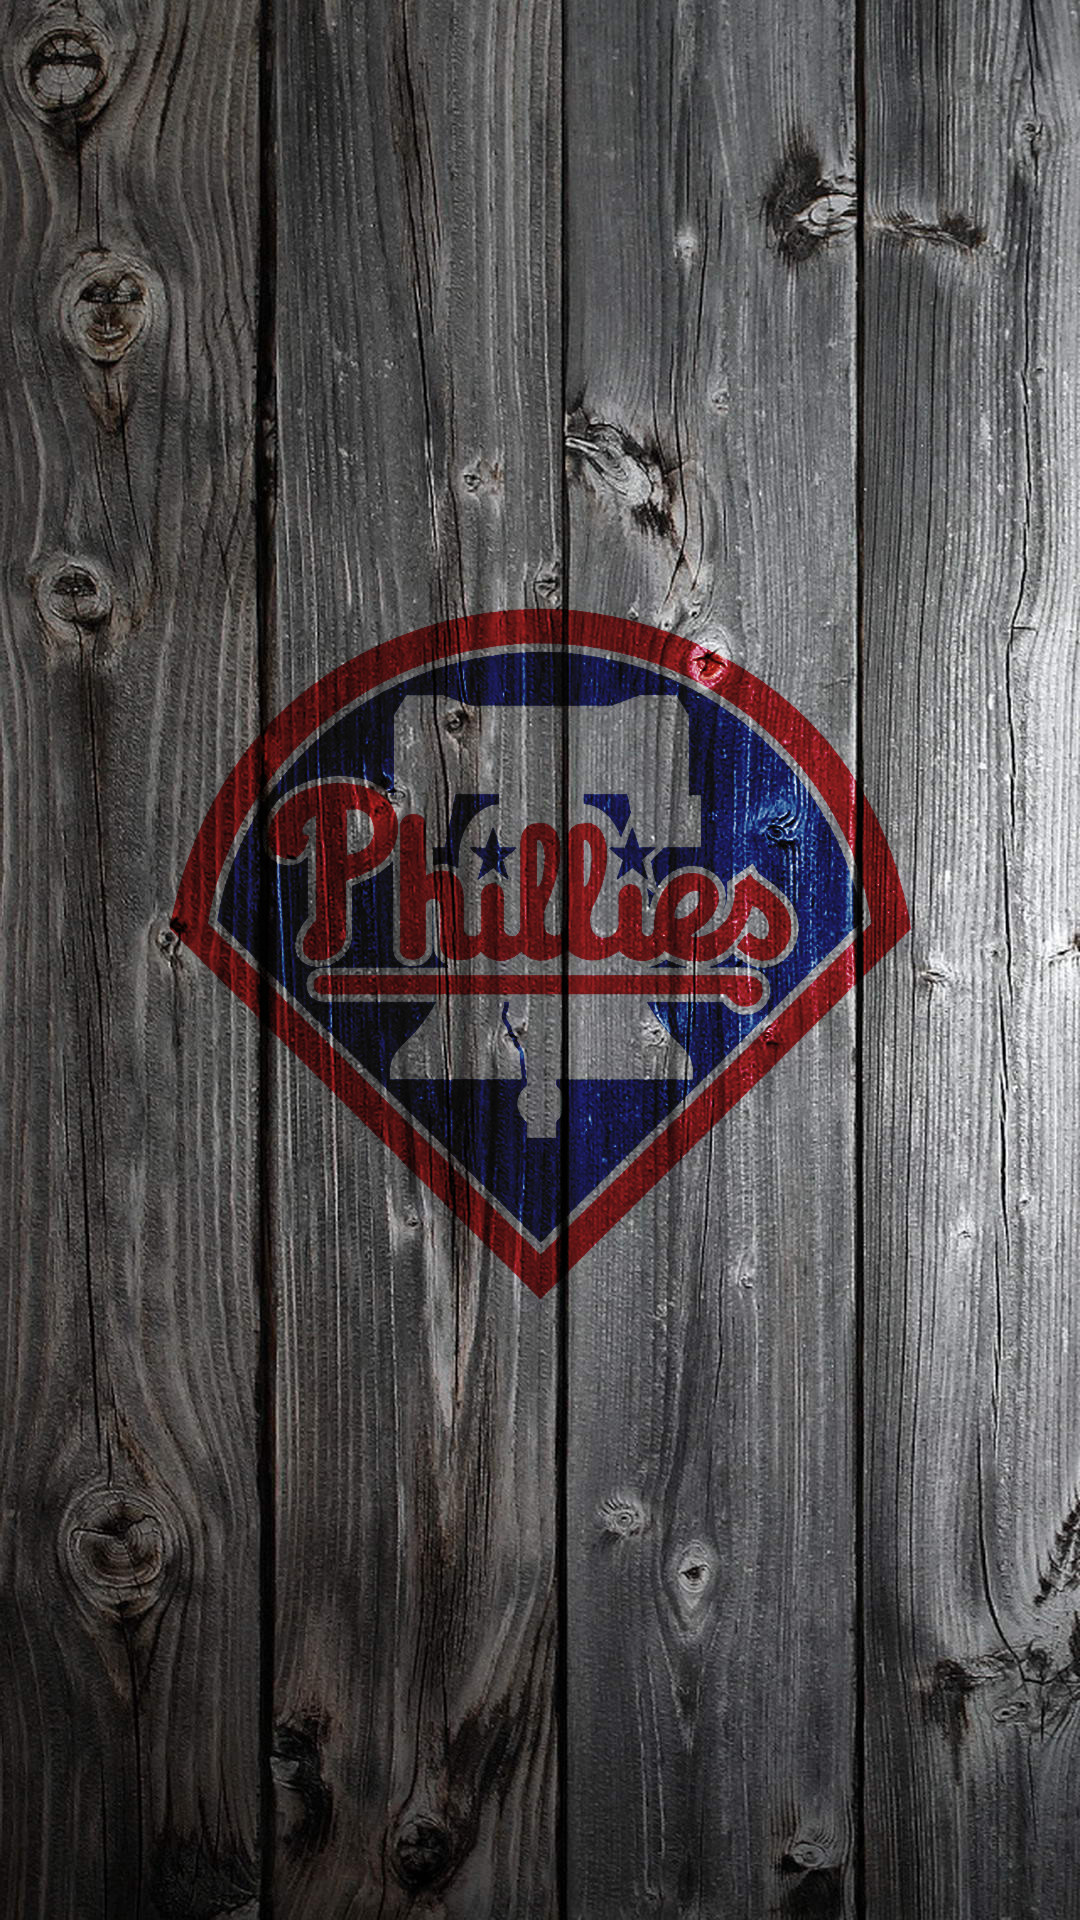 Philadelphia Phillies Wood Hd Wallpaper For Iphone 6 Plus within  Philadelphia Phillies Phone Wallpapers …